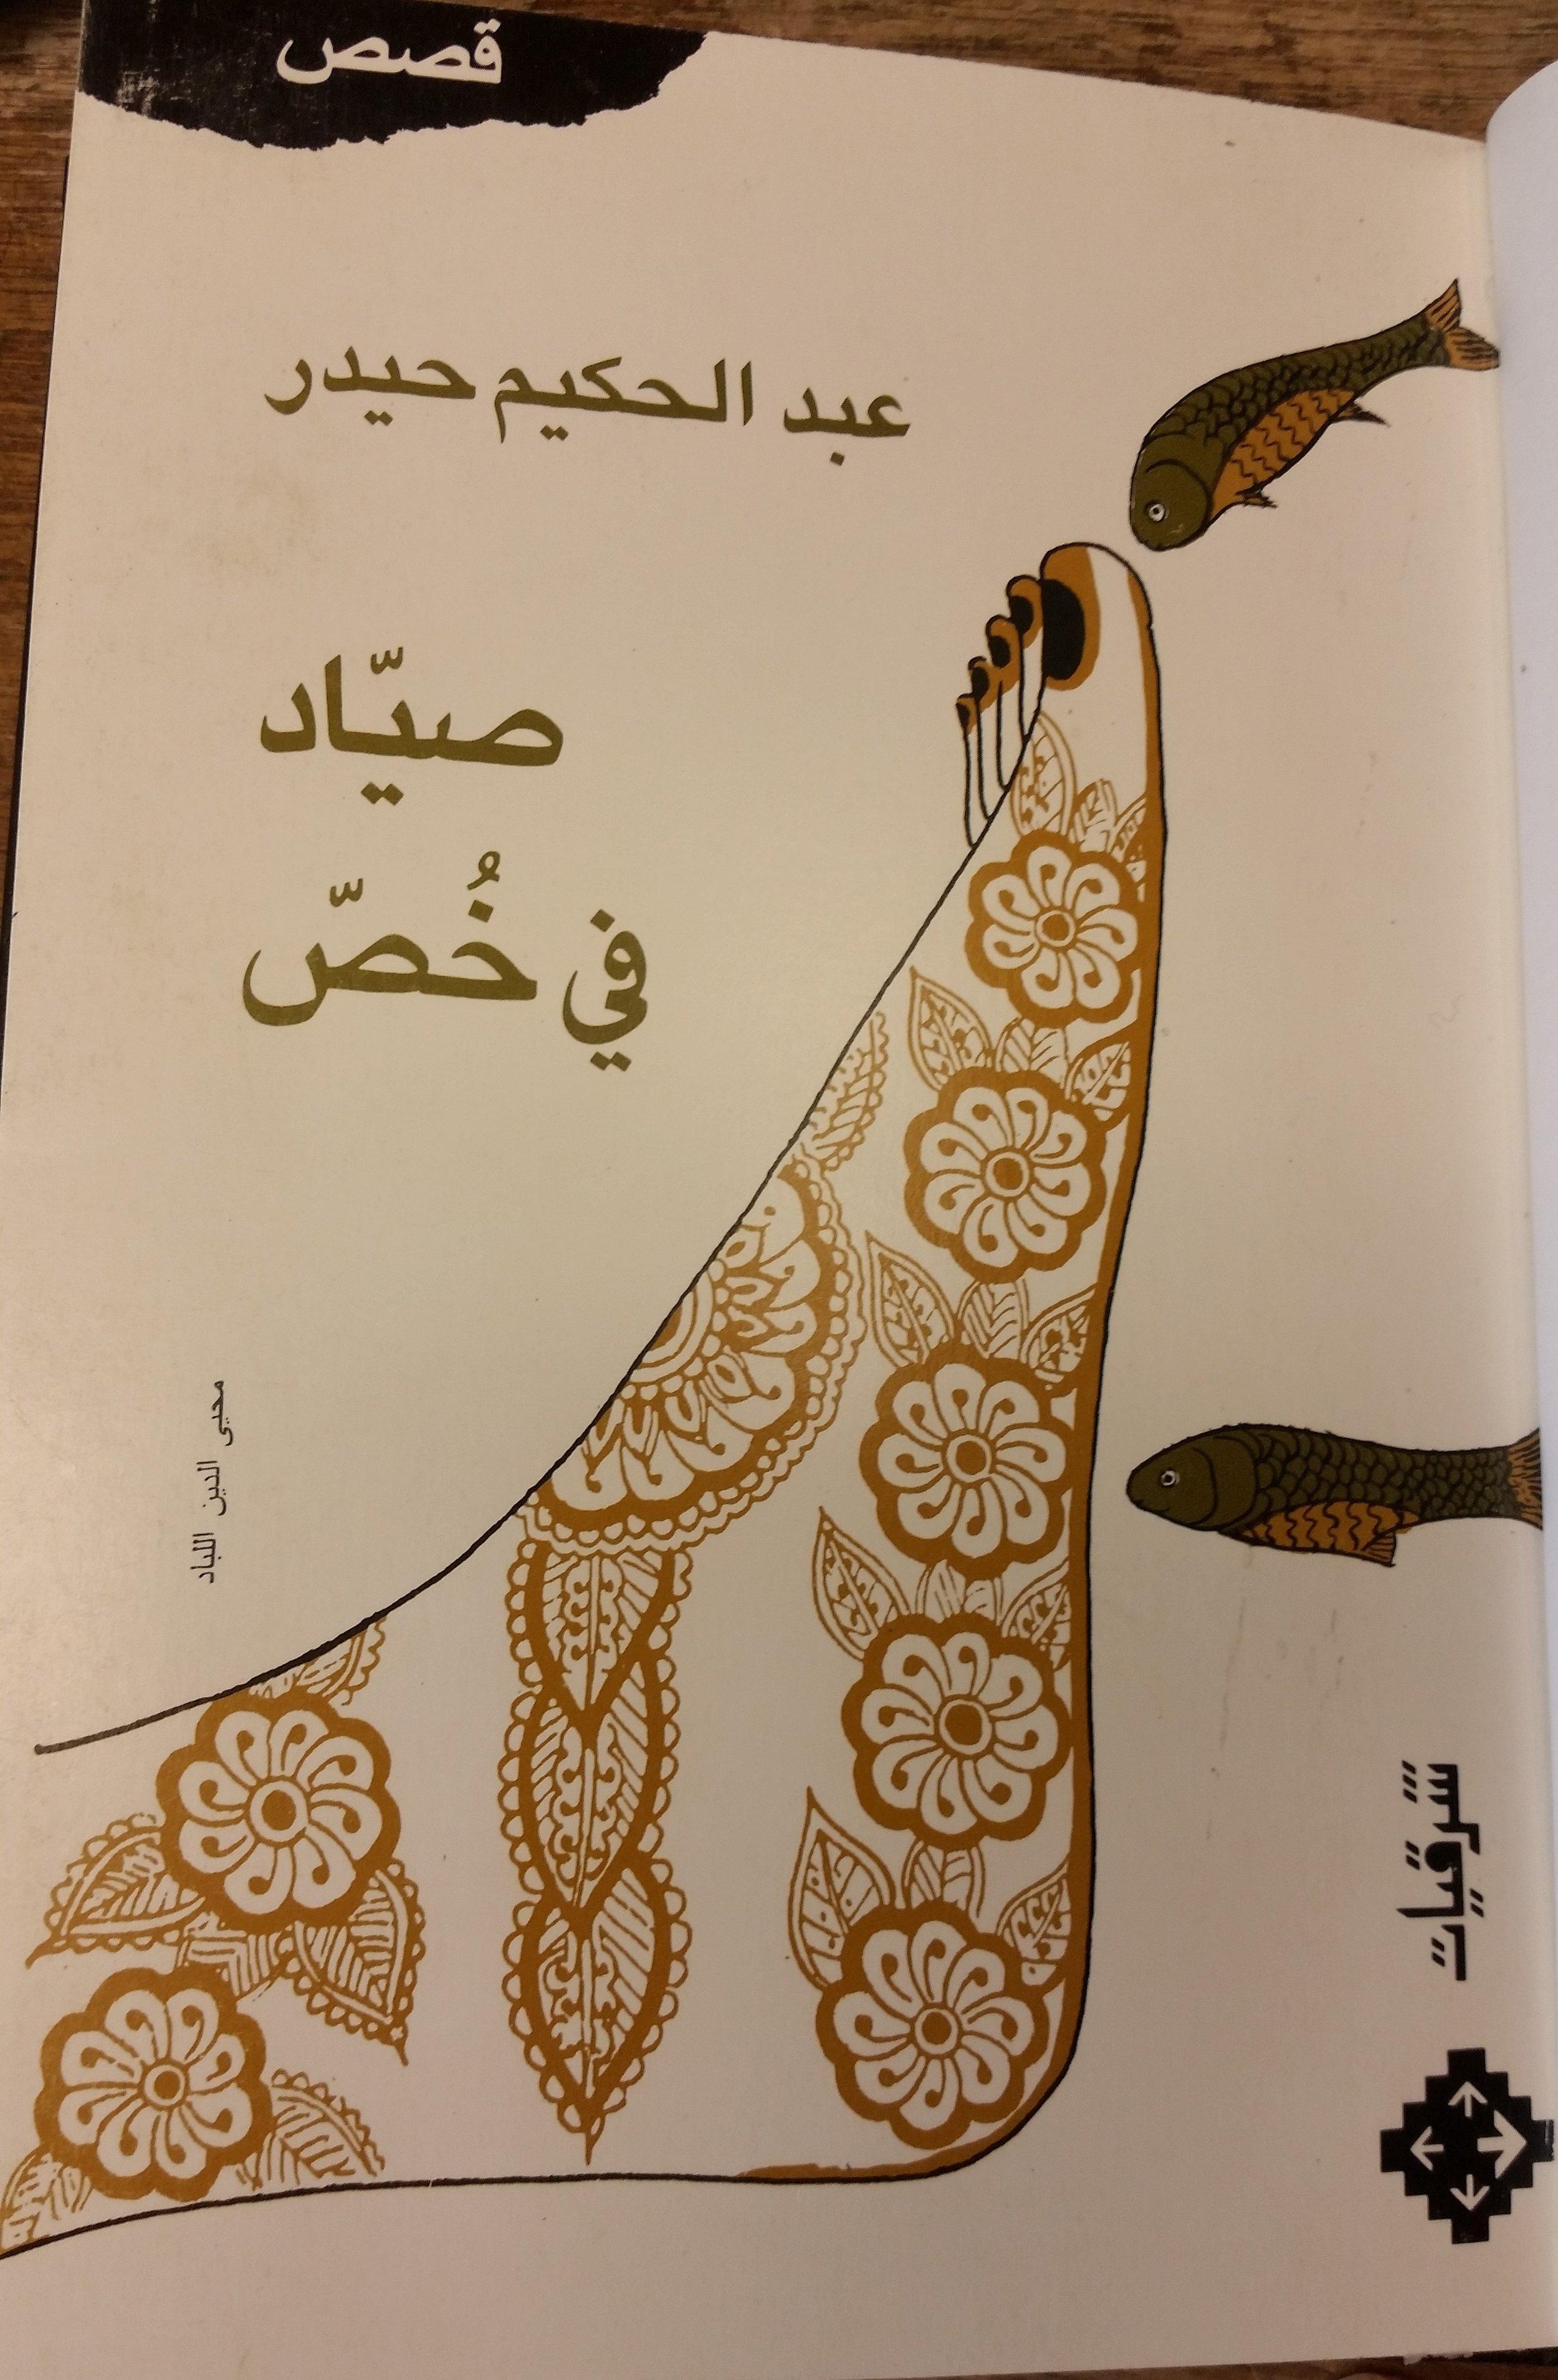 Short story collection  Ṣayyād fī khuṣṣ  by ʻAbd al-Ḥakīm Ḥaydar (al-Qāhirah : Dār Sharqīyāt lil-Nashr wa-al-Tawzīʻ, 1995).